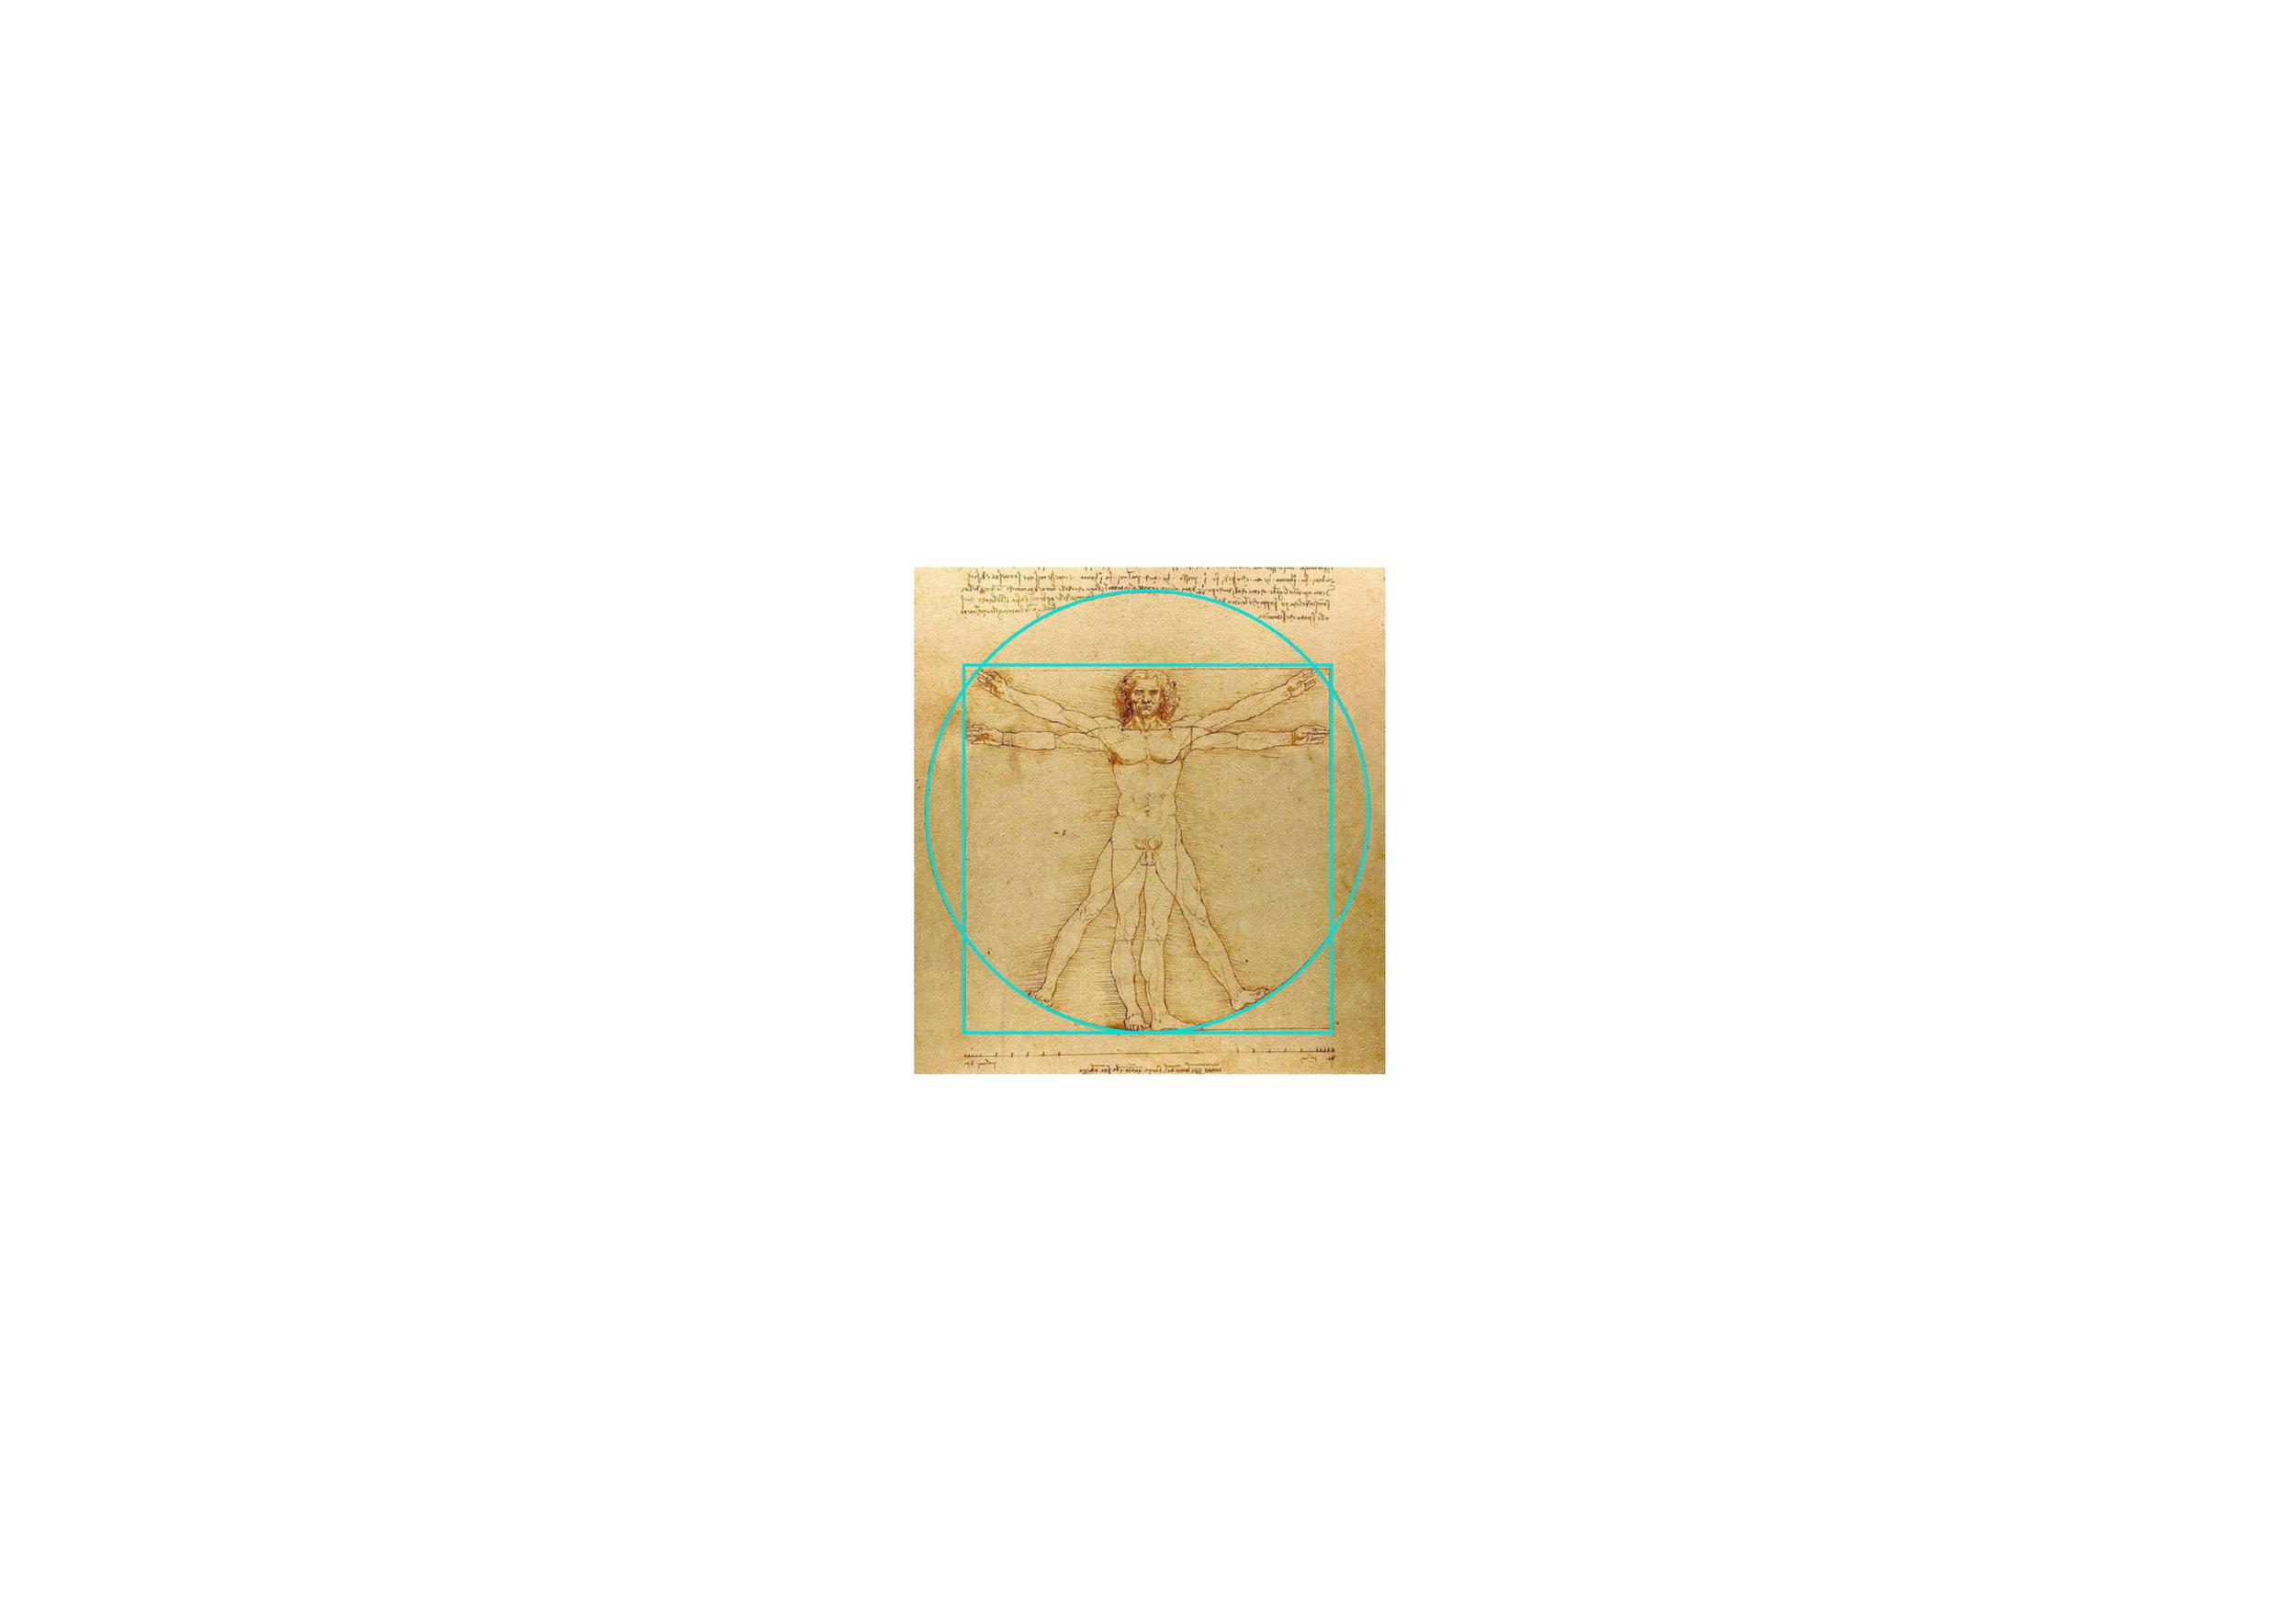 190207 FULCRUM CONCEPT WIP-04.jpg